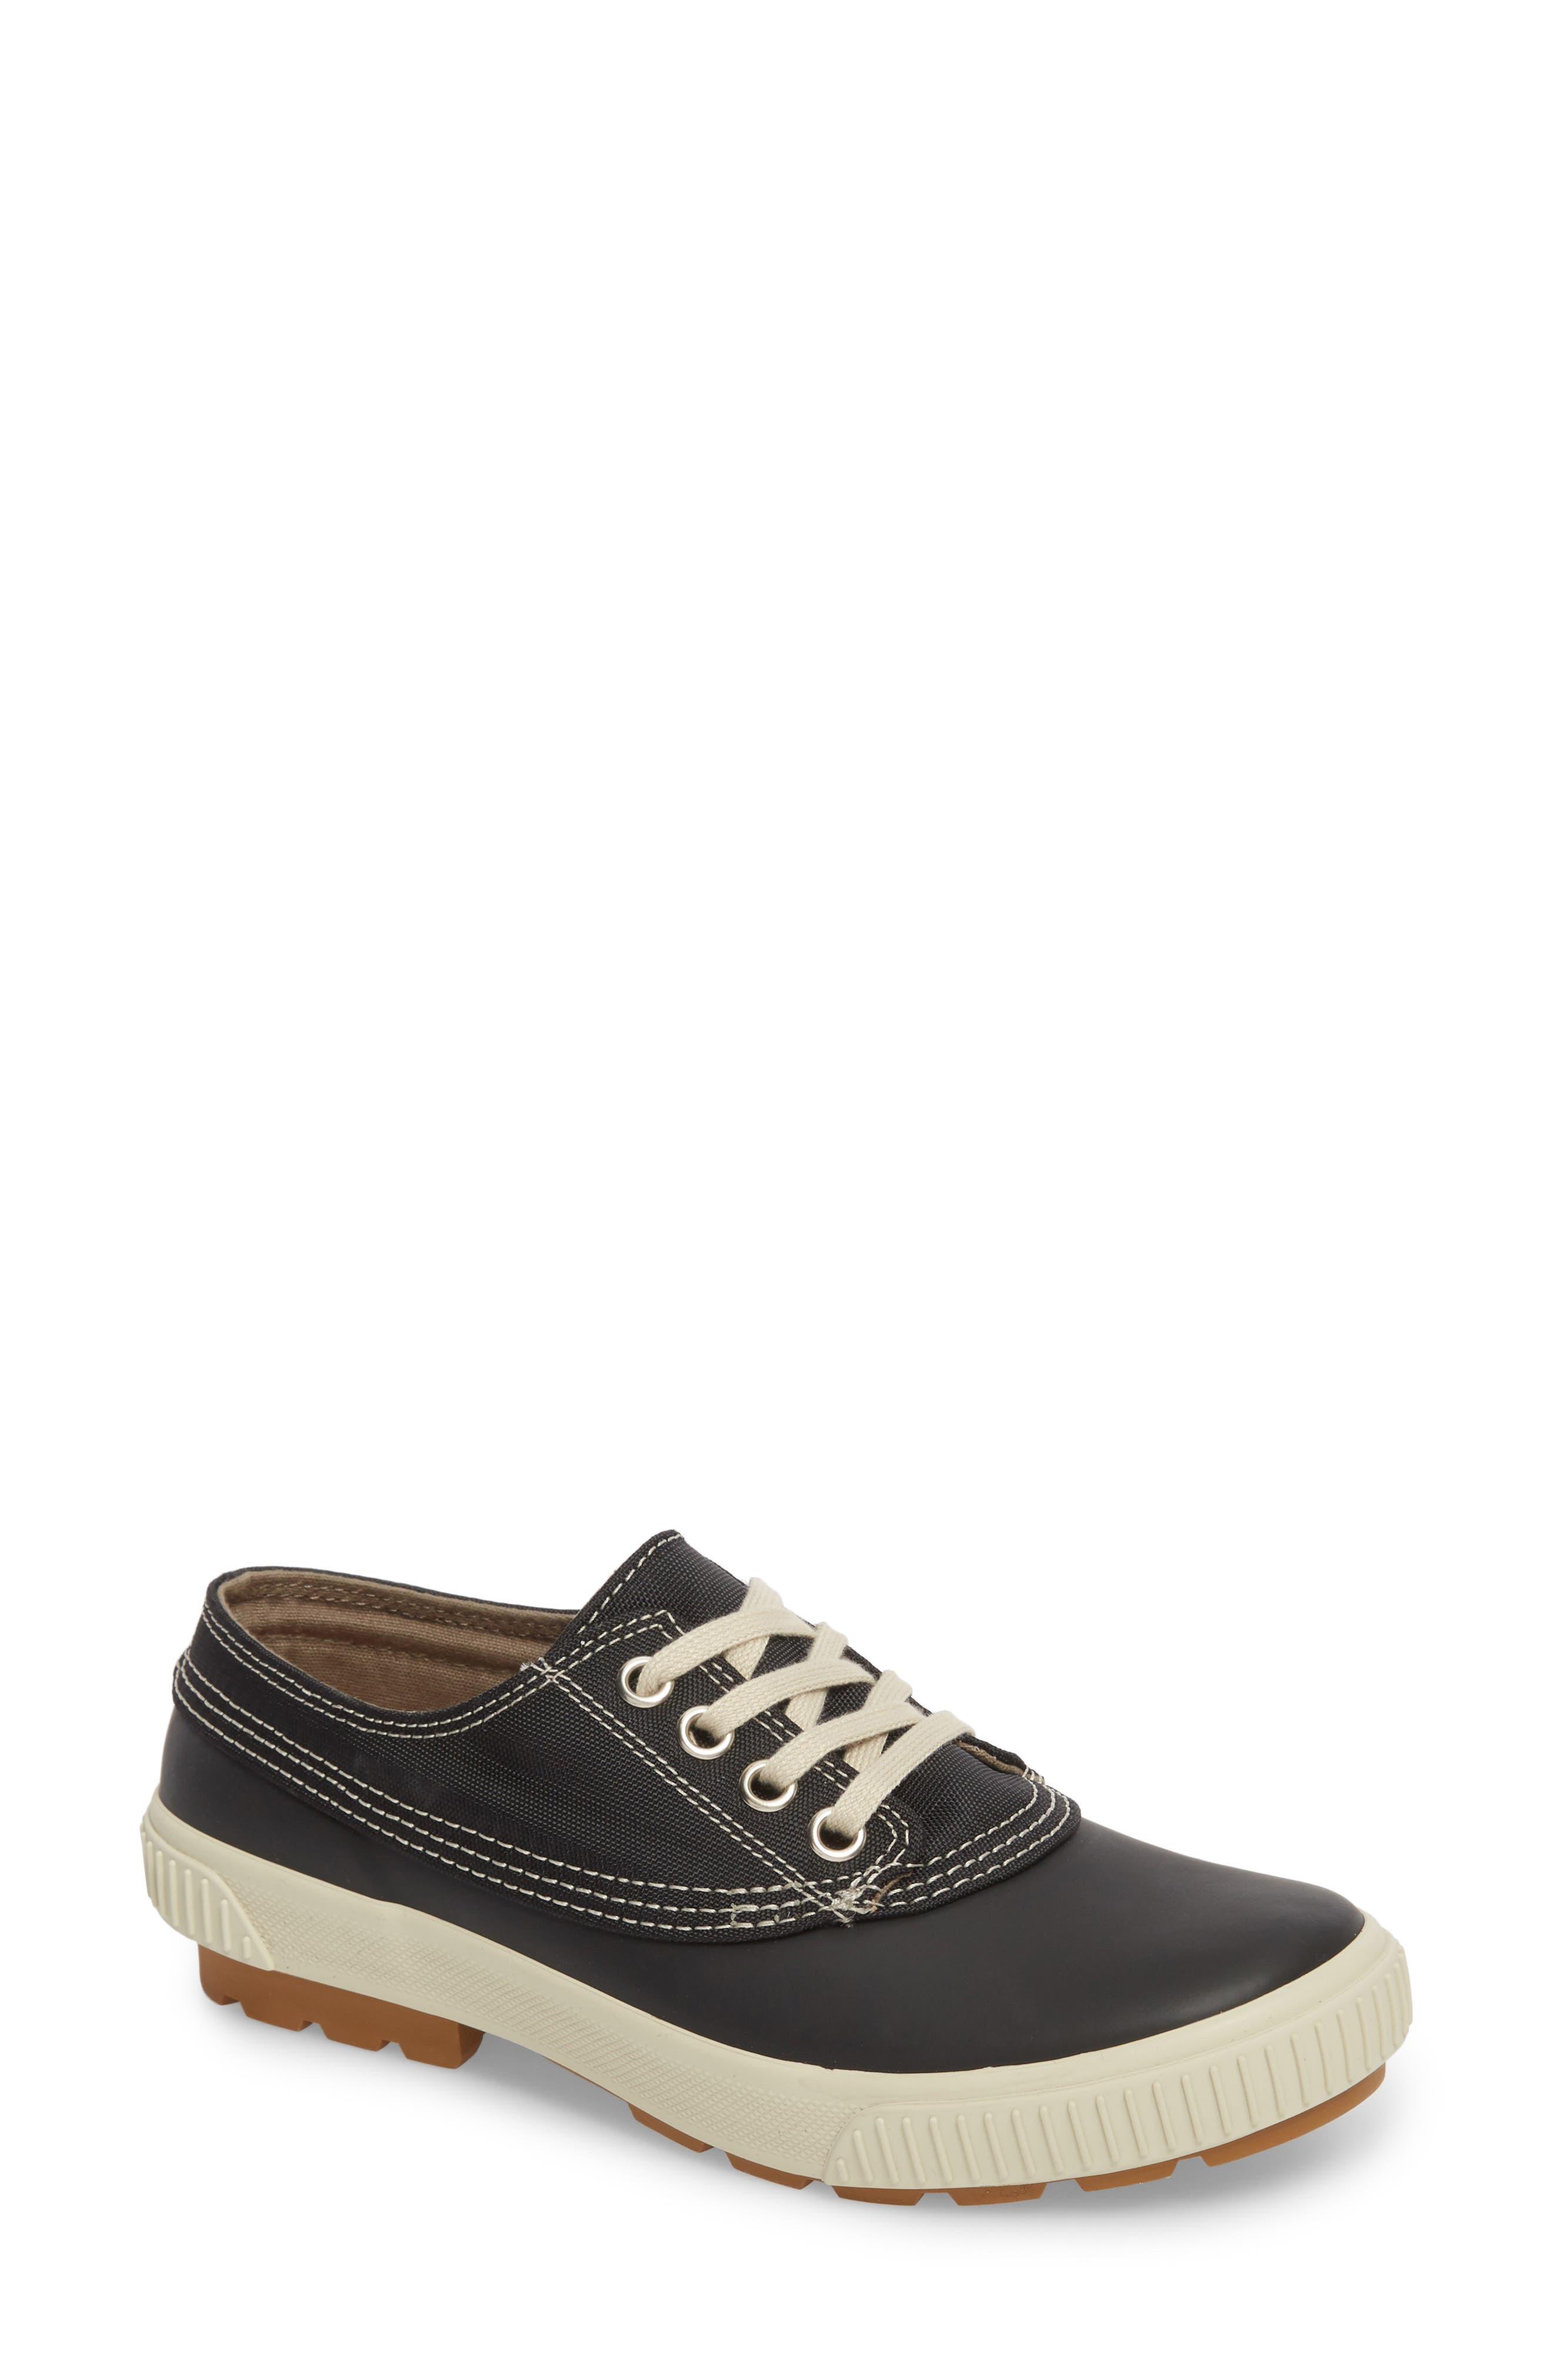 Dash Duck Sneaker,                         Main,                         color, BLACK